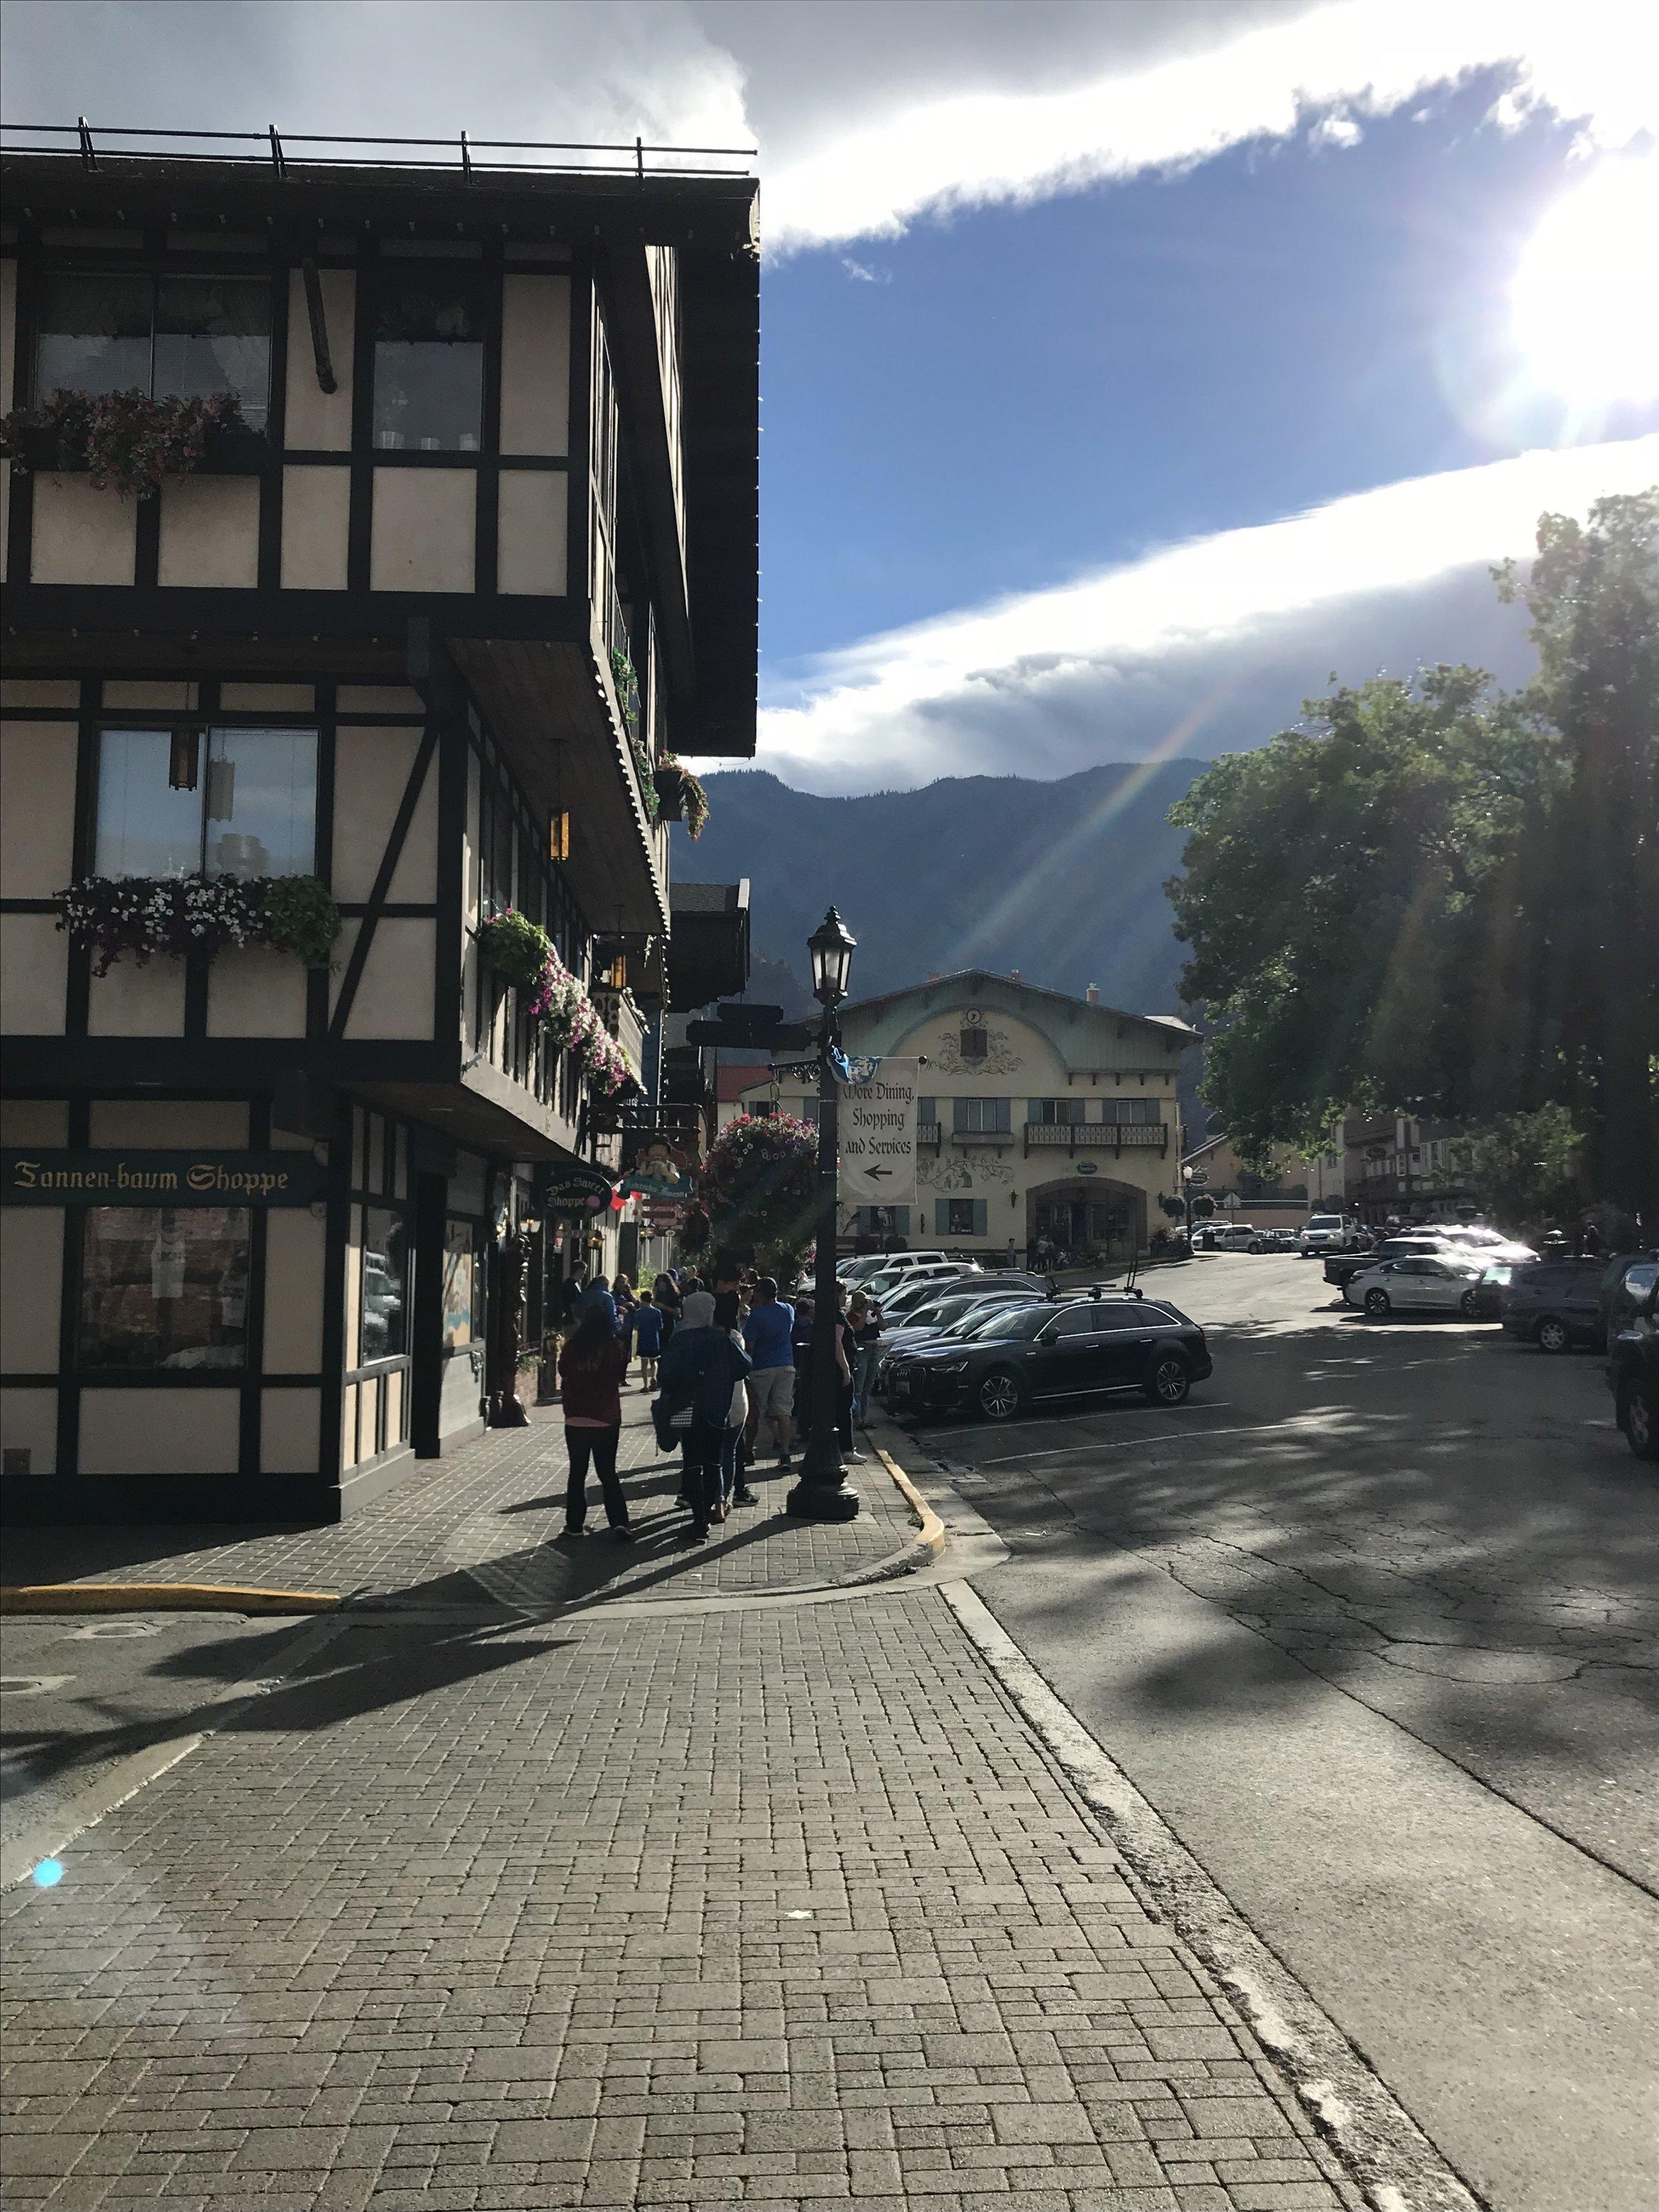 Afternoon in Leavenworth